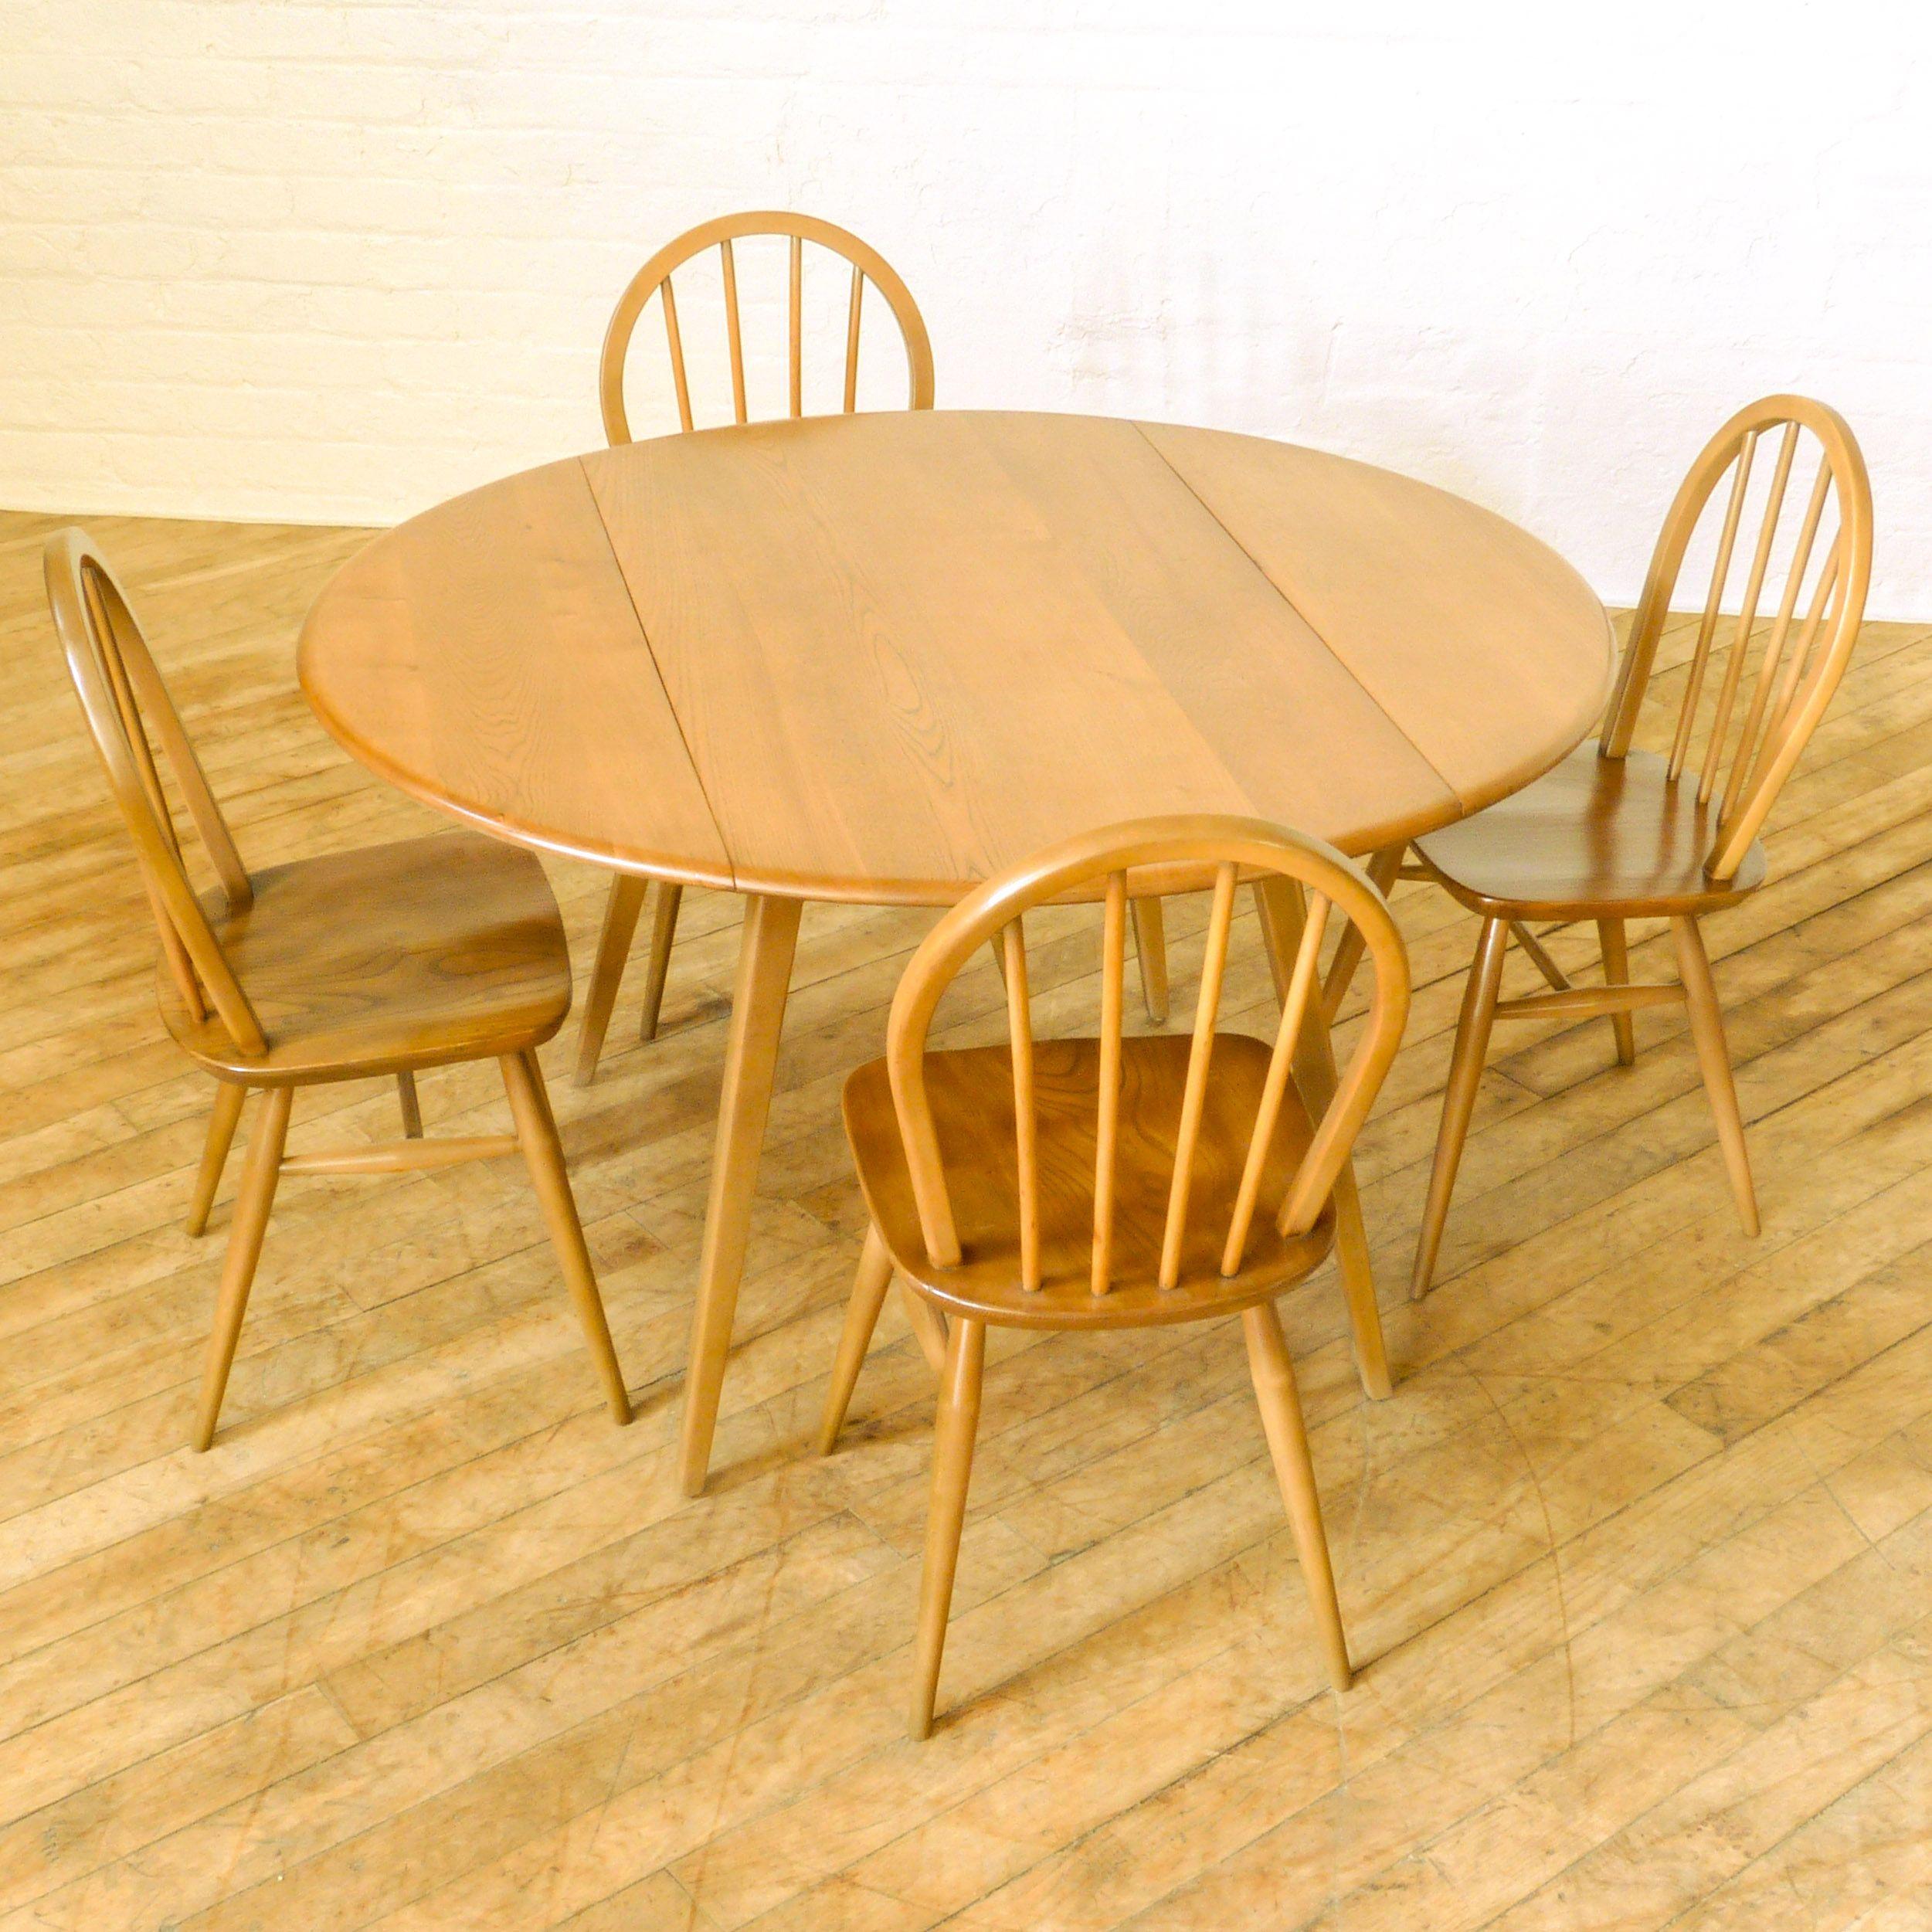 a 1960 u0027s ercol dining suite a 1960 u0027s ercol dining suite   mellan rutorna pod logo   pinterest      rh   pinterest com